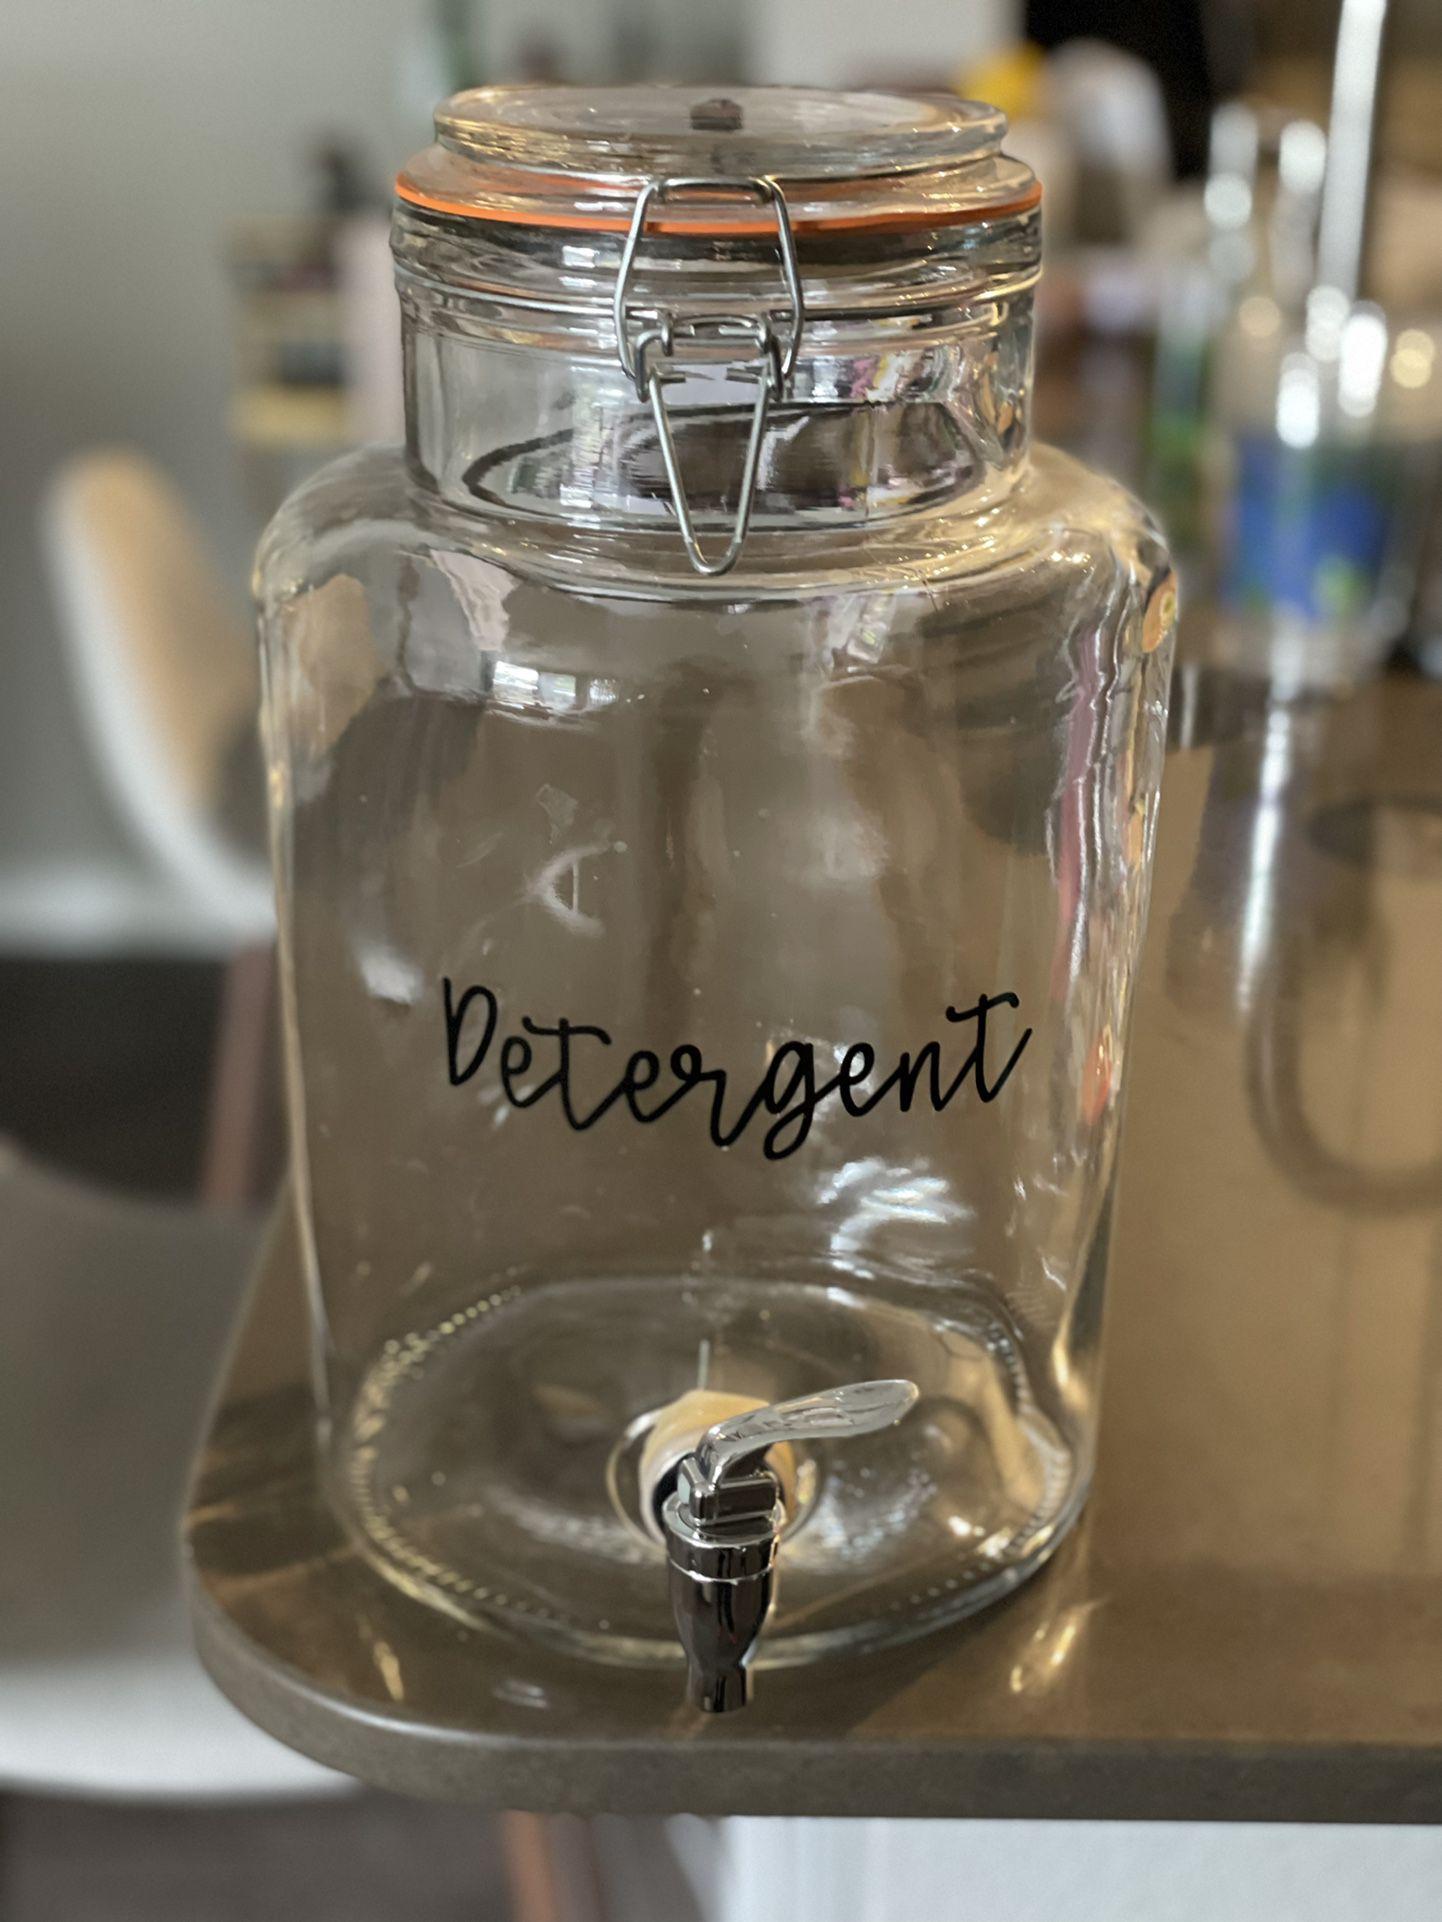 Laundry Detergent Glass Jar